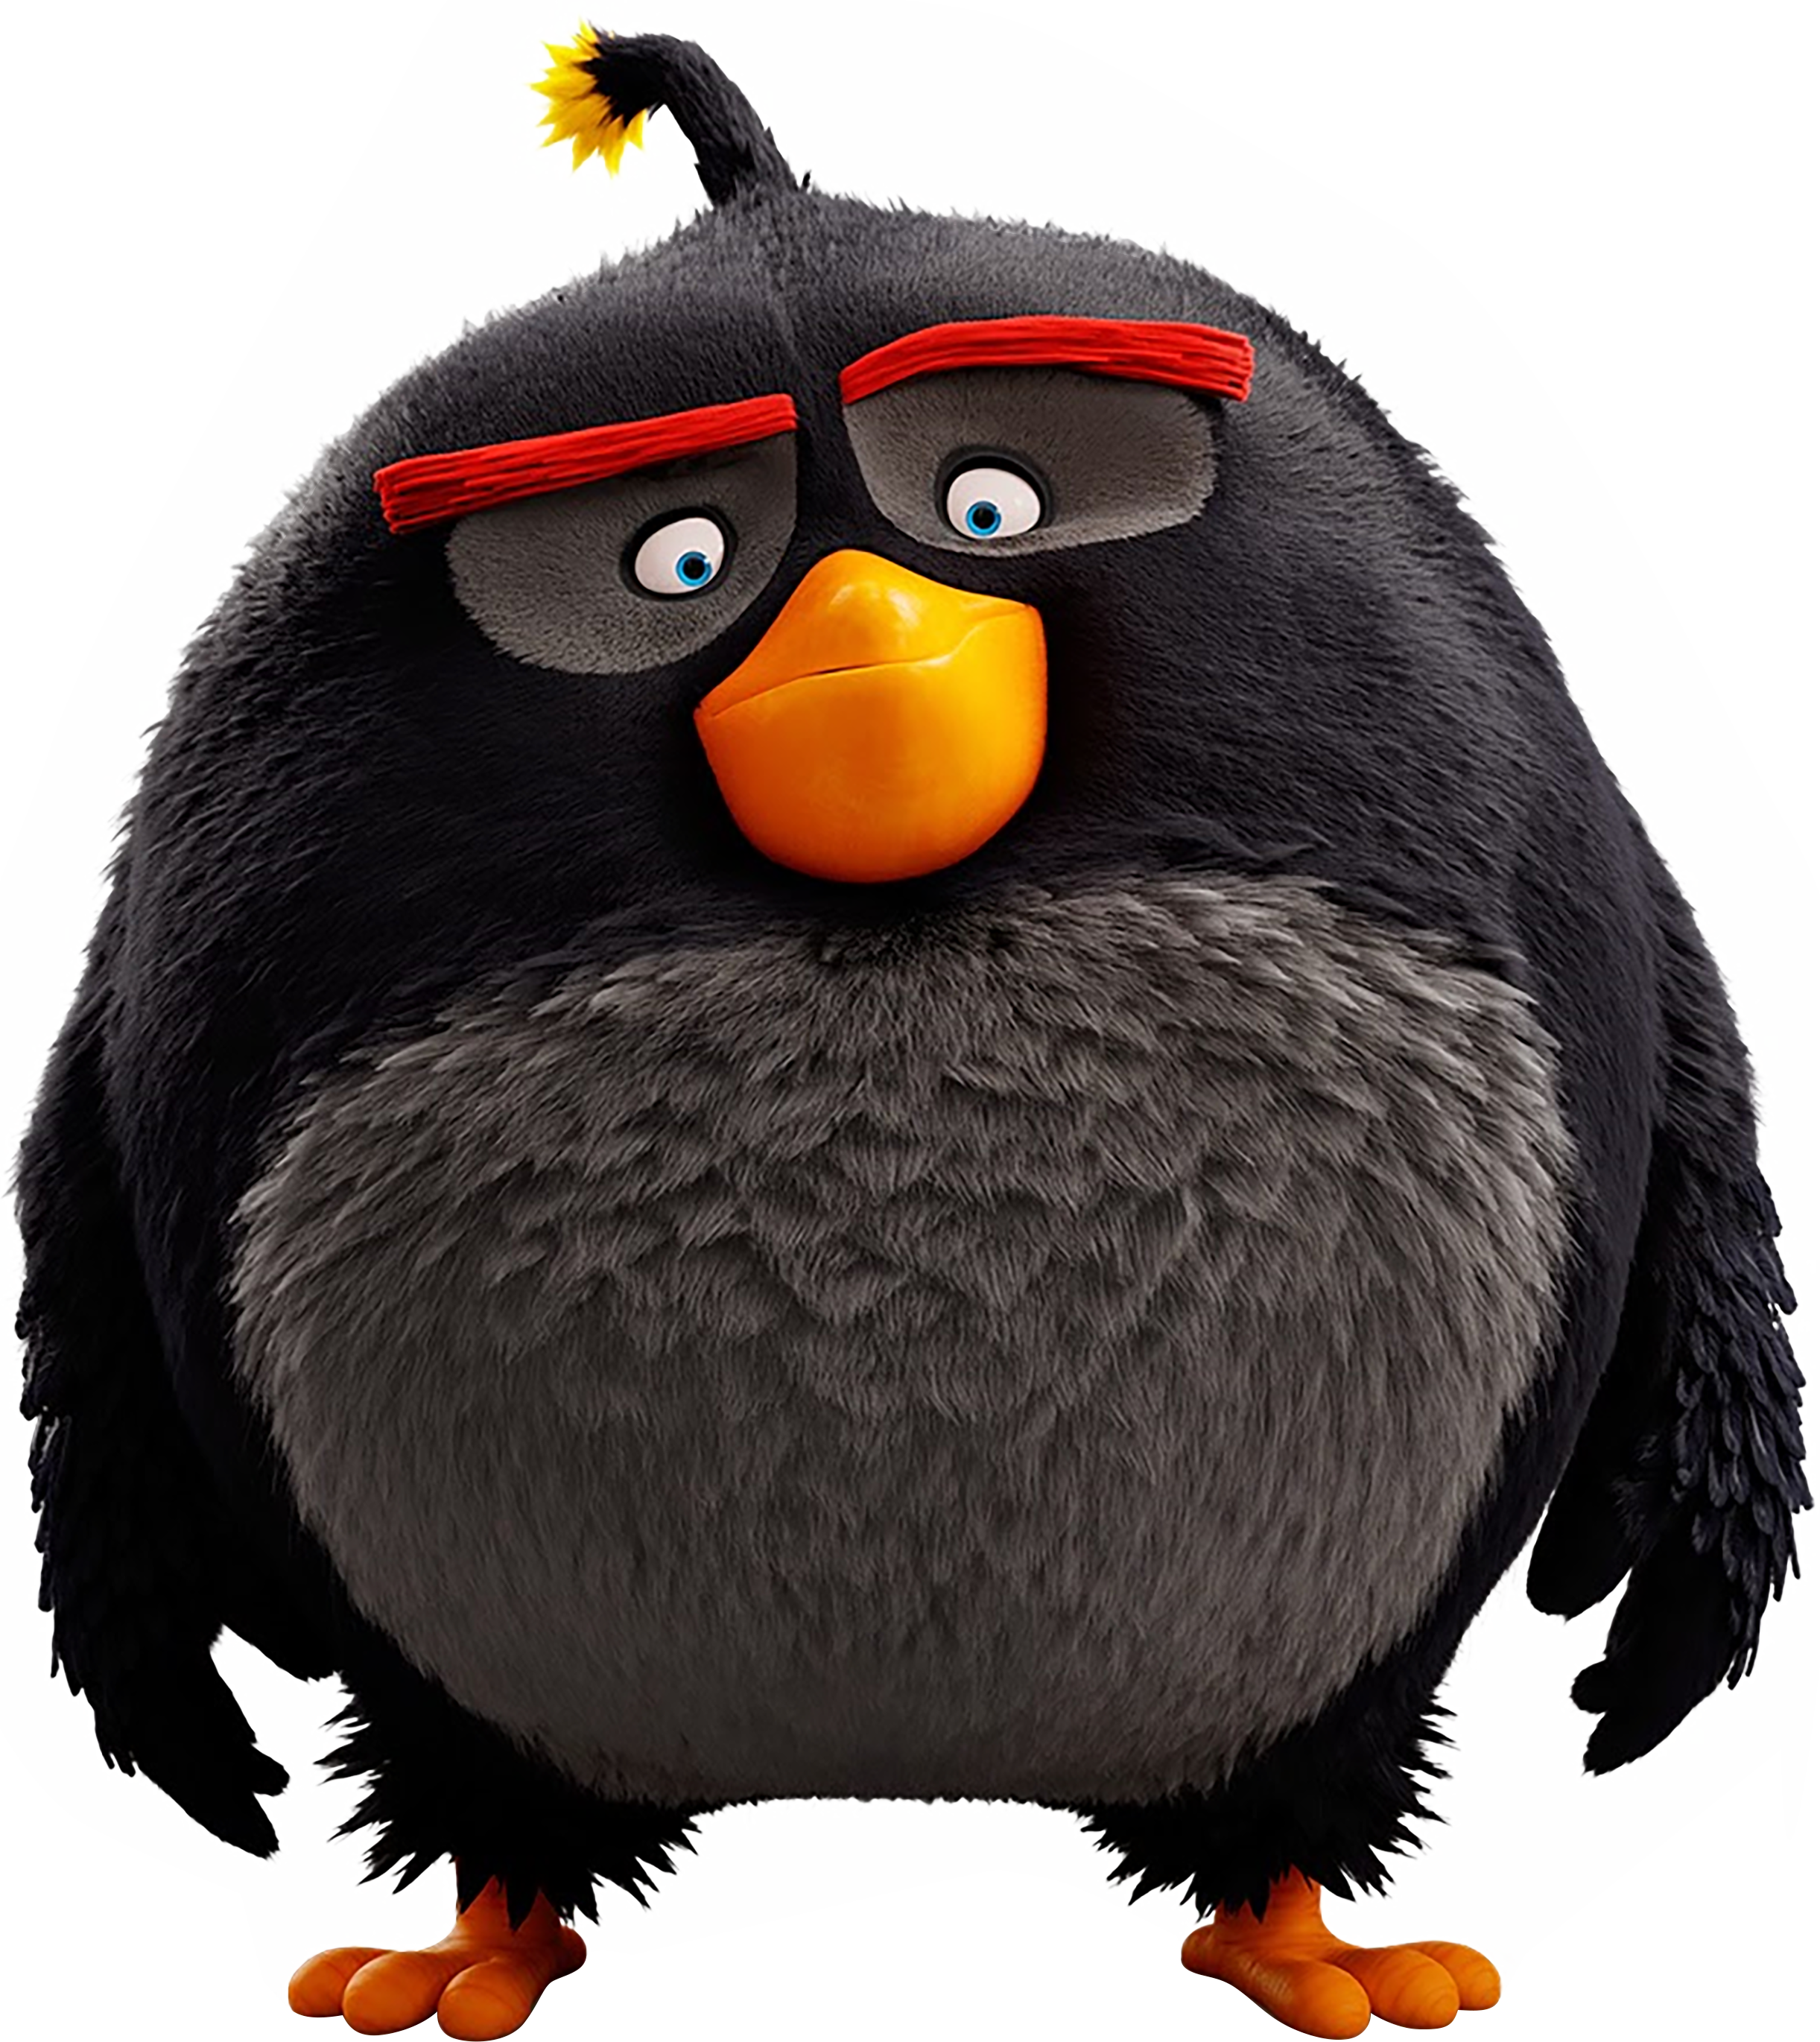 Pin De Pancho M En Angry Birds Pelicula Png Dibujos Animados Angry Birds Dibujos